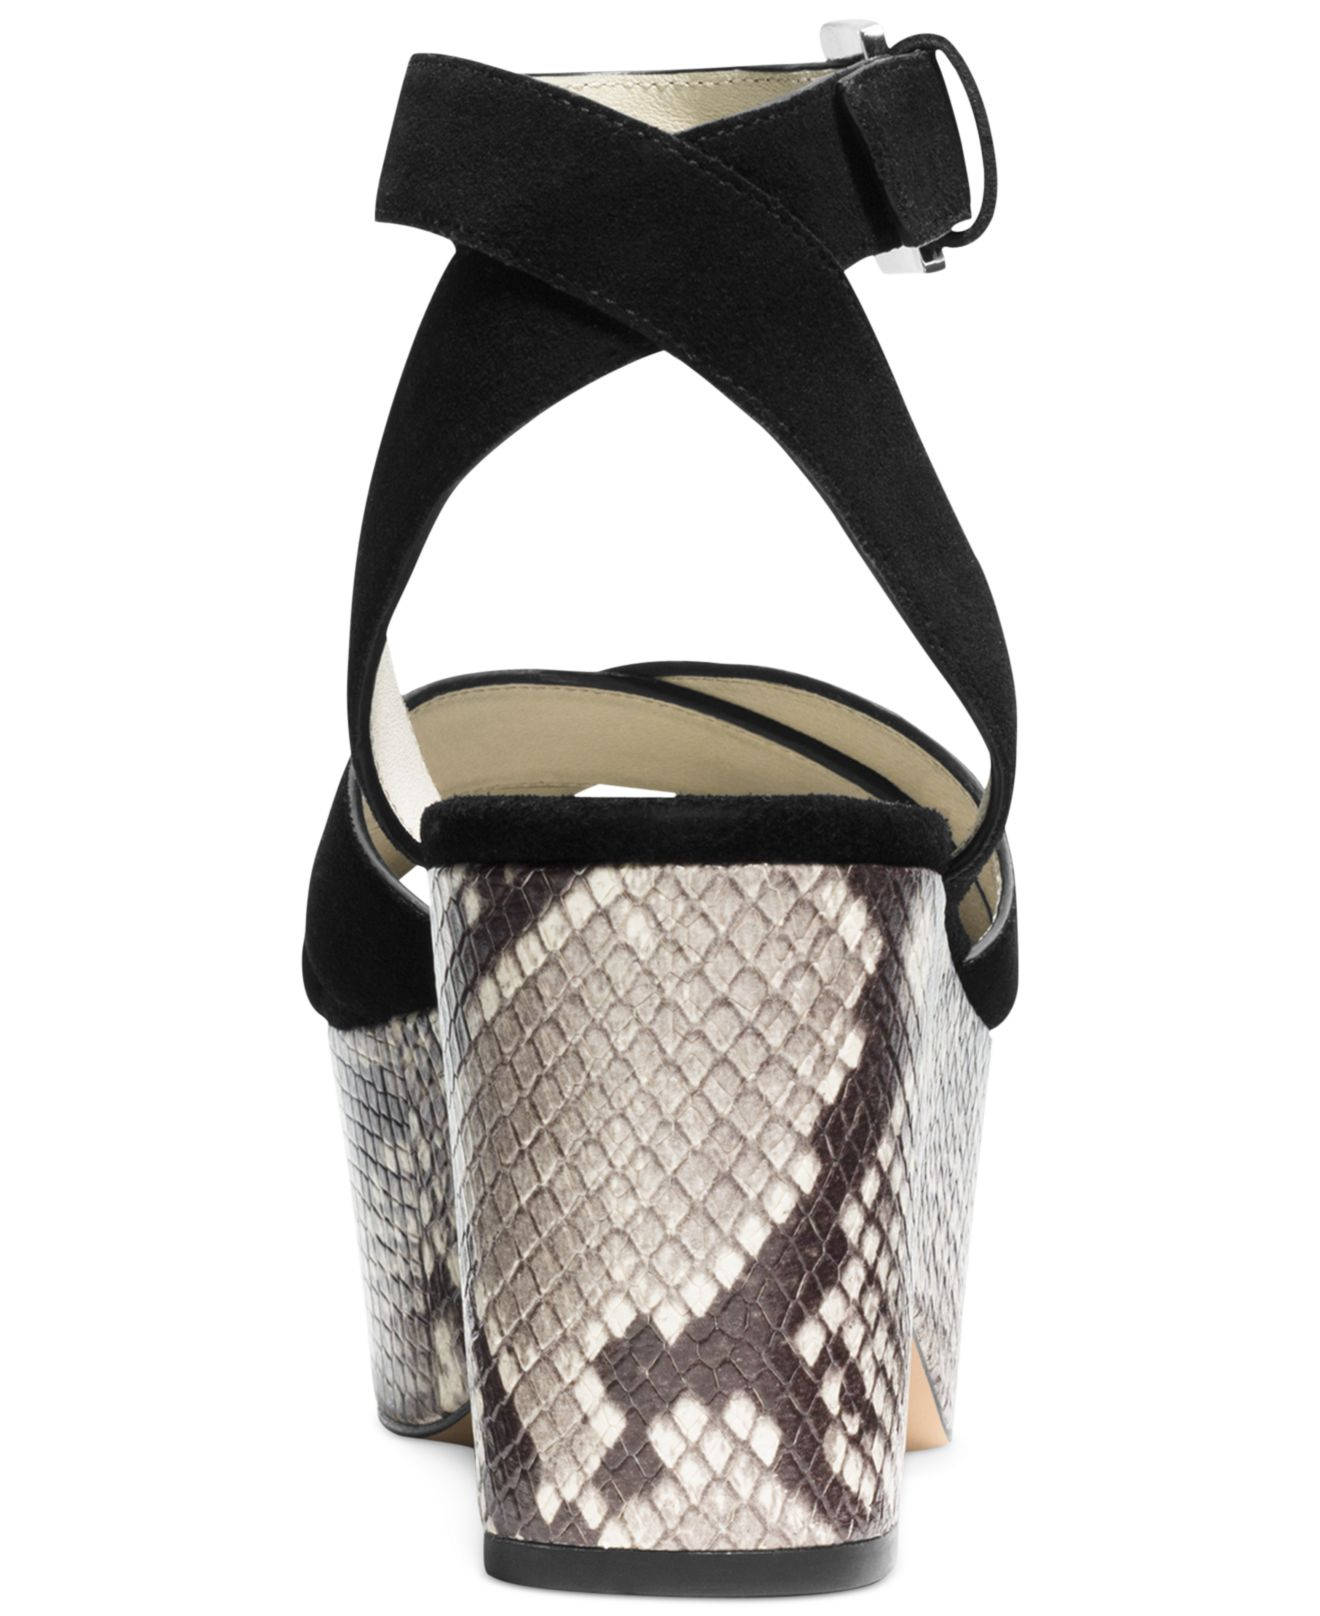 41feae543e4 Lyst - Michael Kors Michael Ariel Platform Wedge Sandals in Black